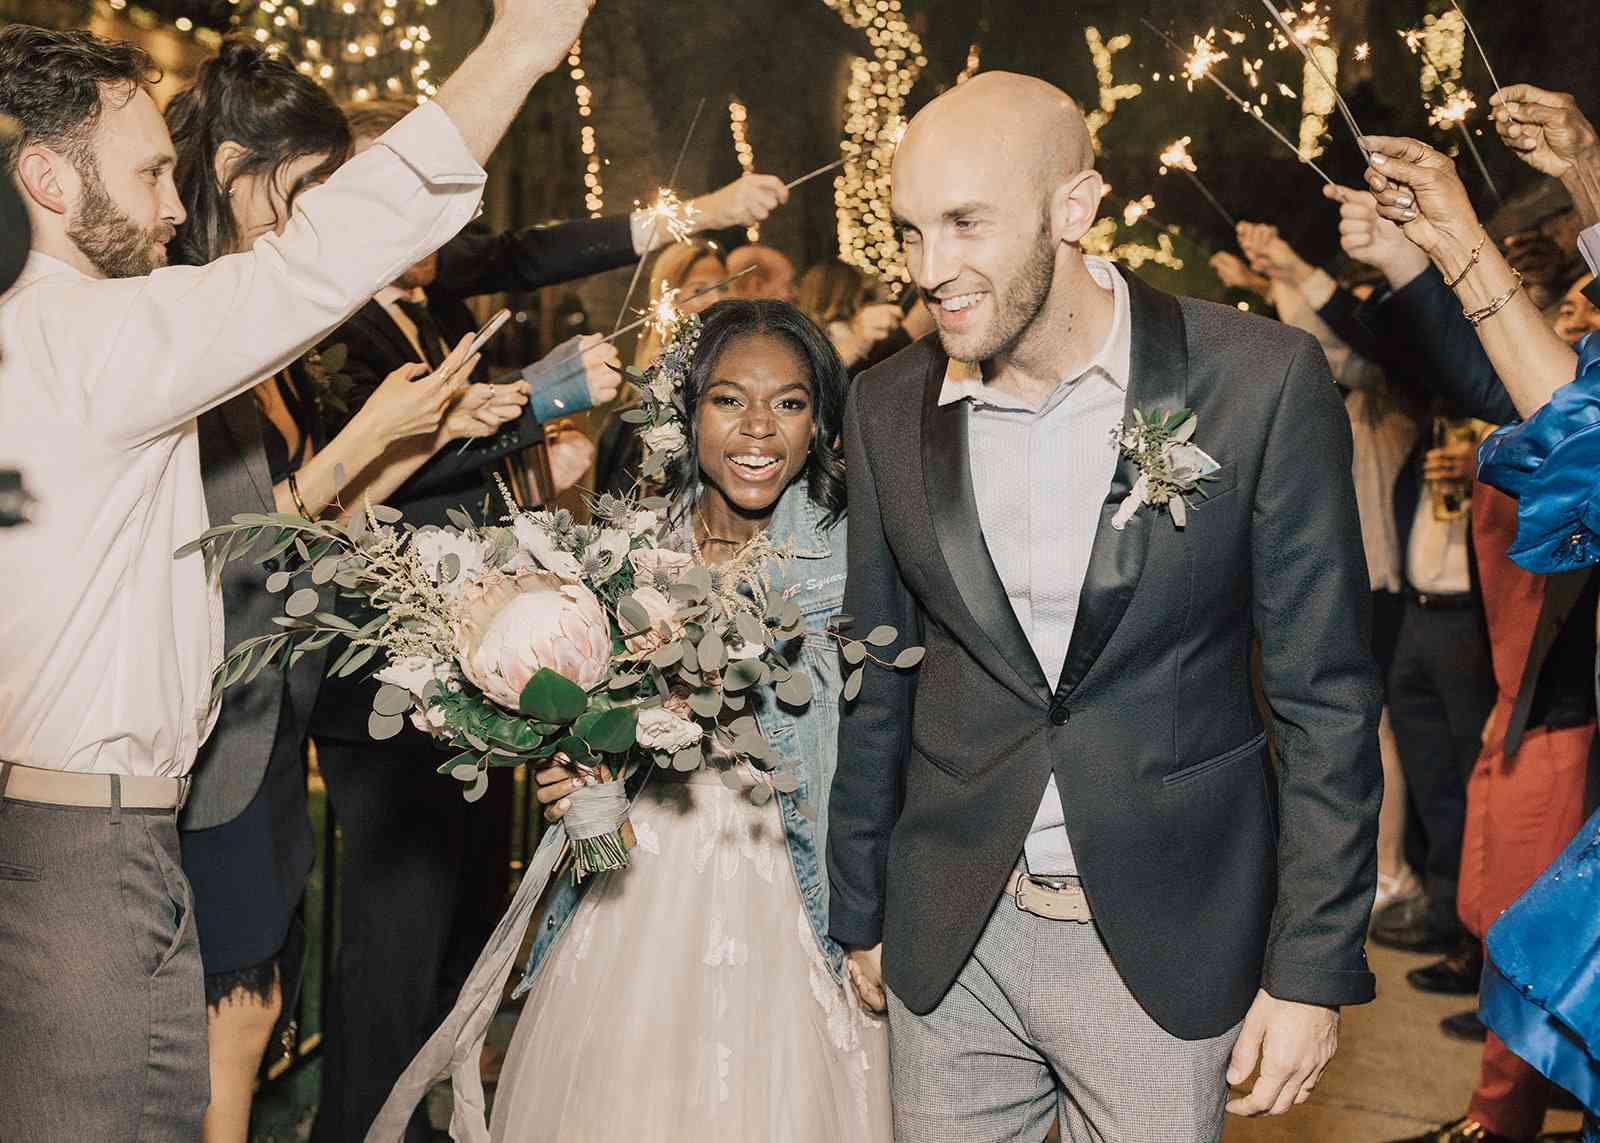 newlyweds leaving reception